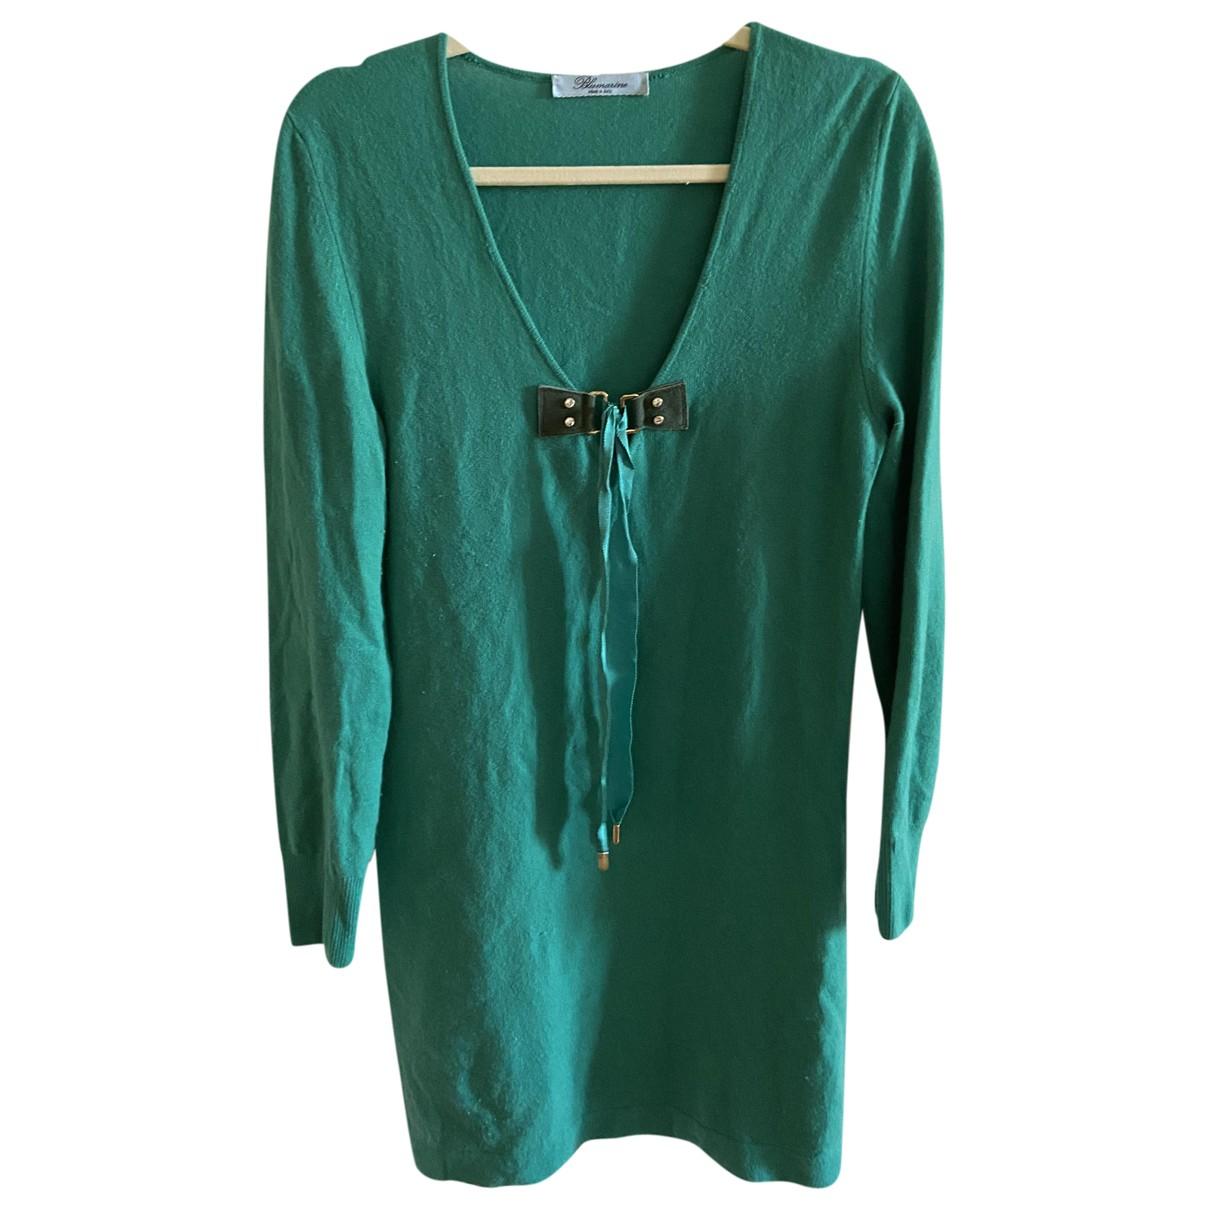 Blumarine \N Kleid in  Gruen Kaschmir